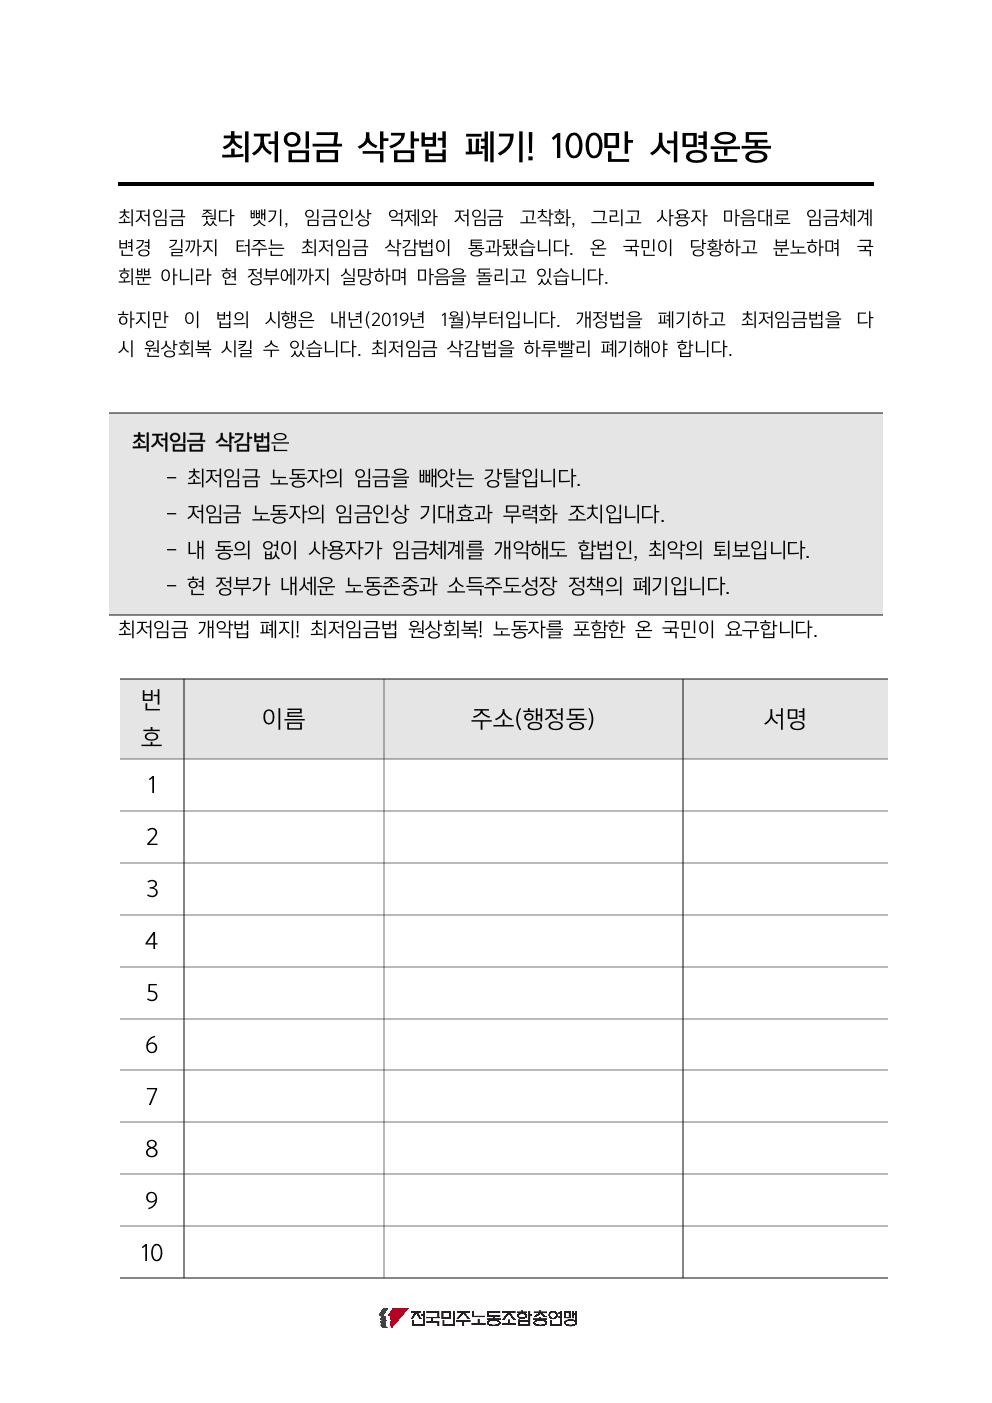 kctu_삭감법폐기_서명지001.jpg